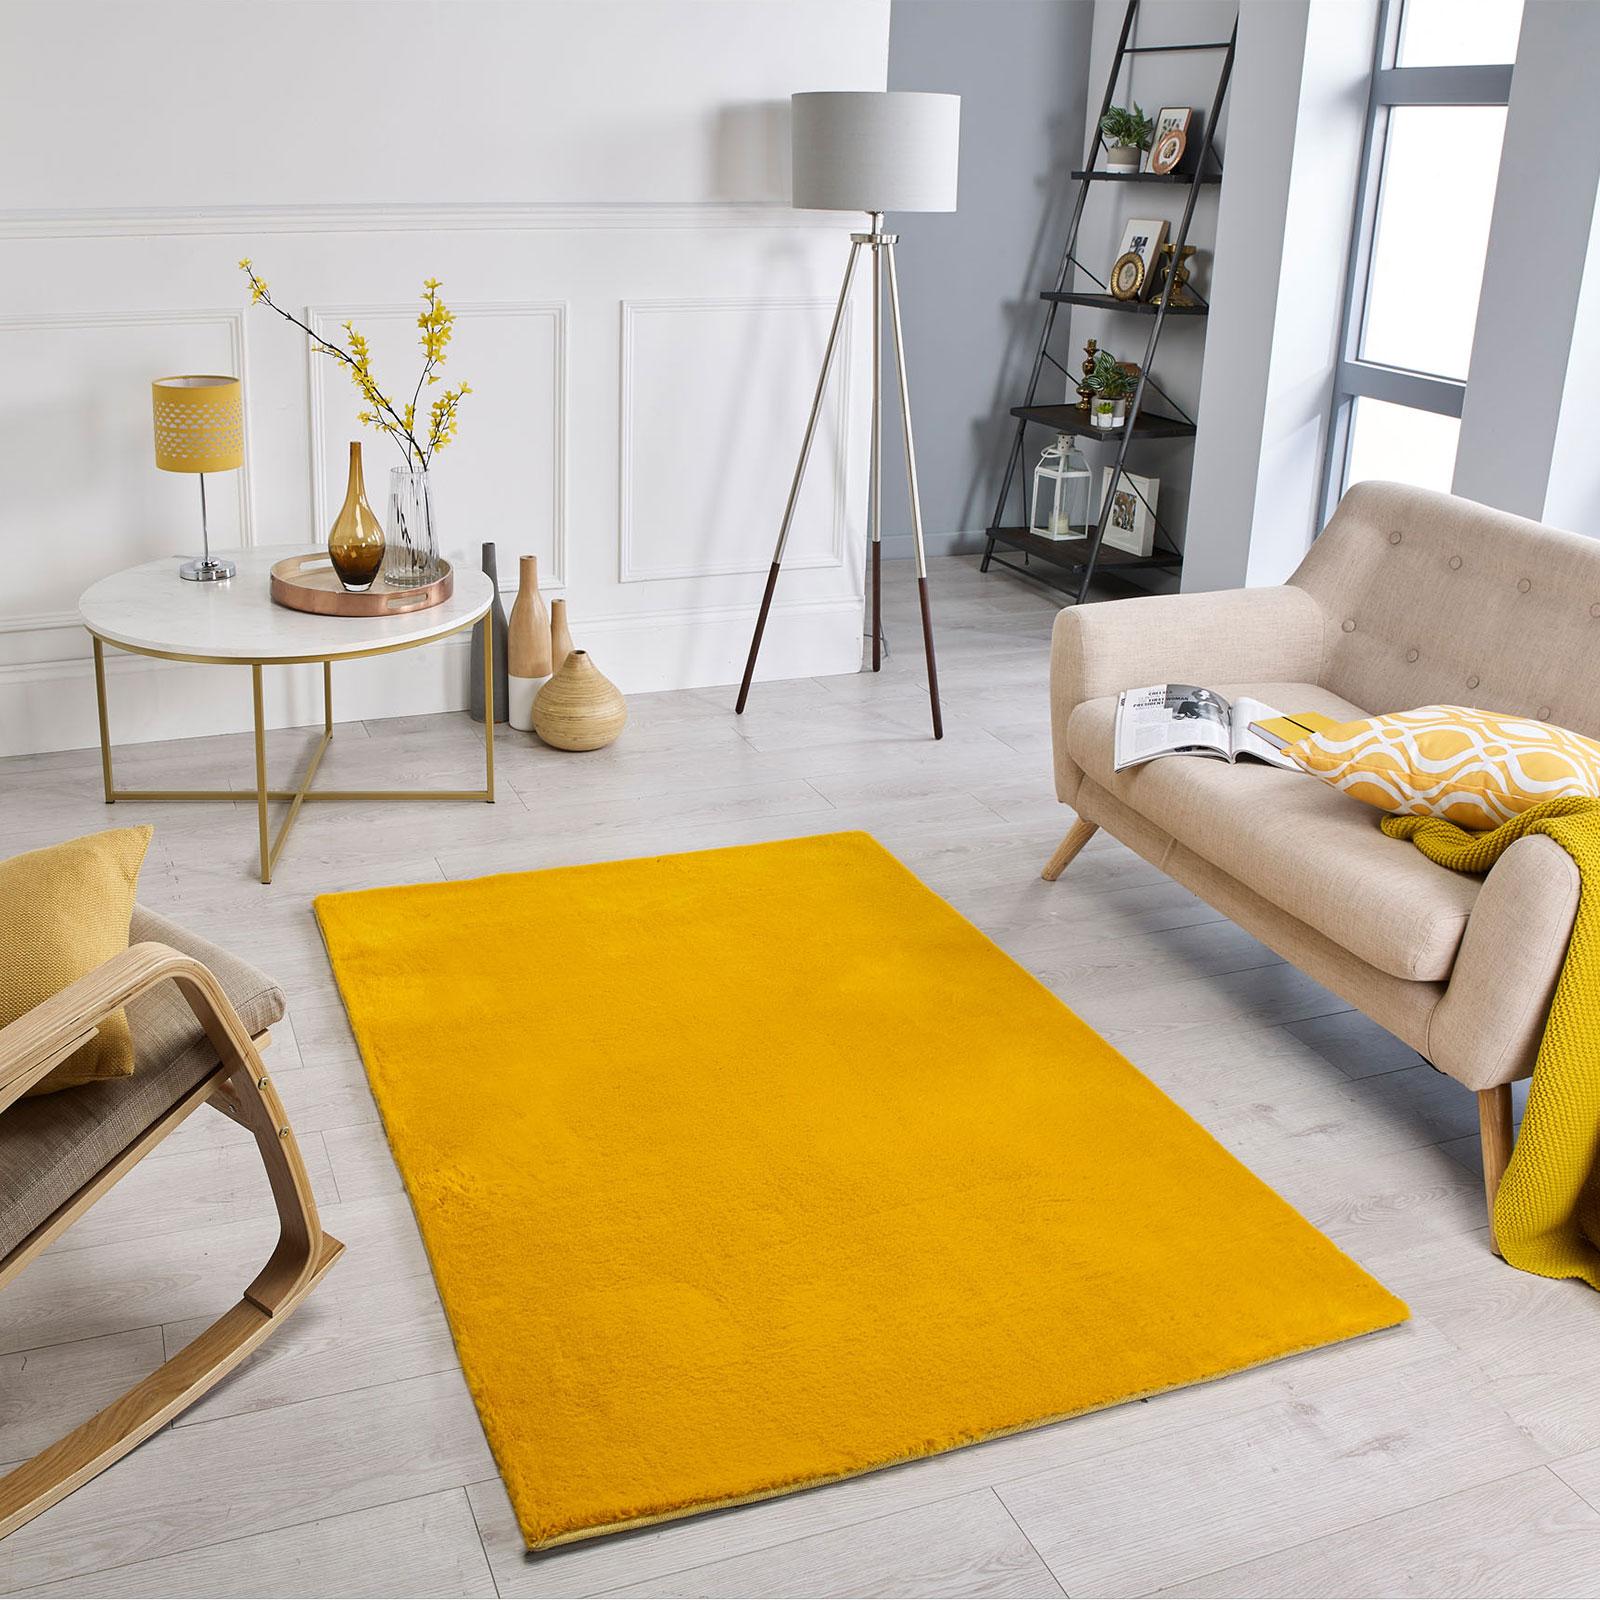 Comfy-Mustard-Roomshot.jpg